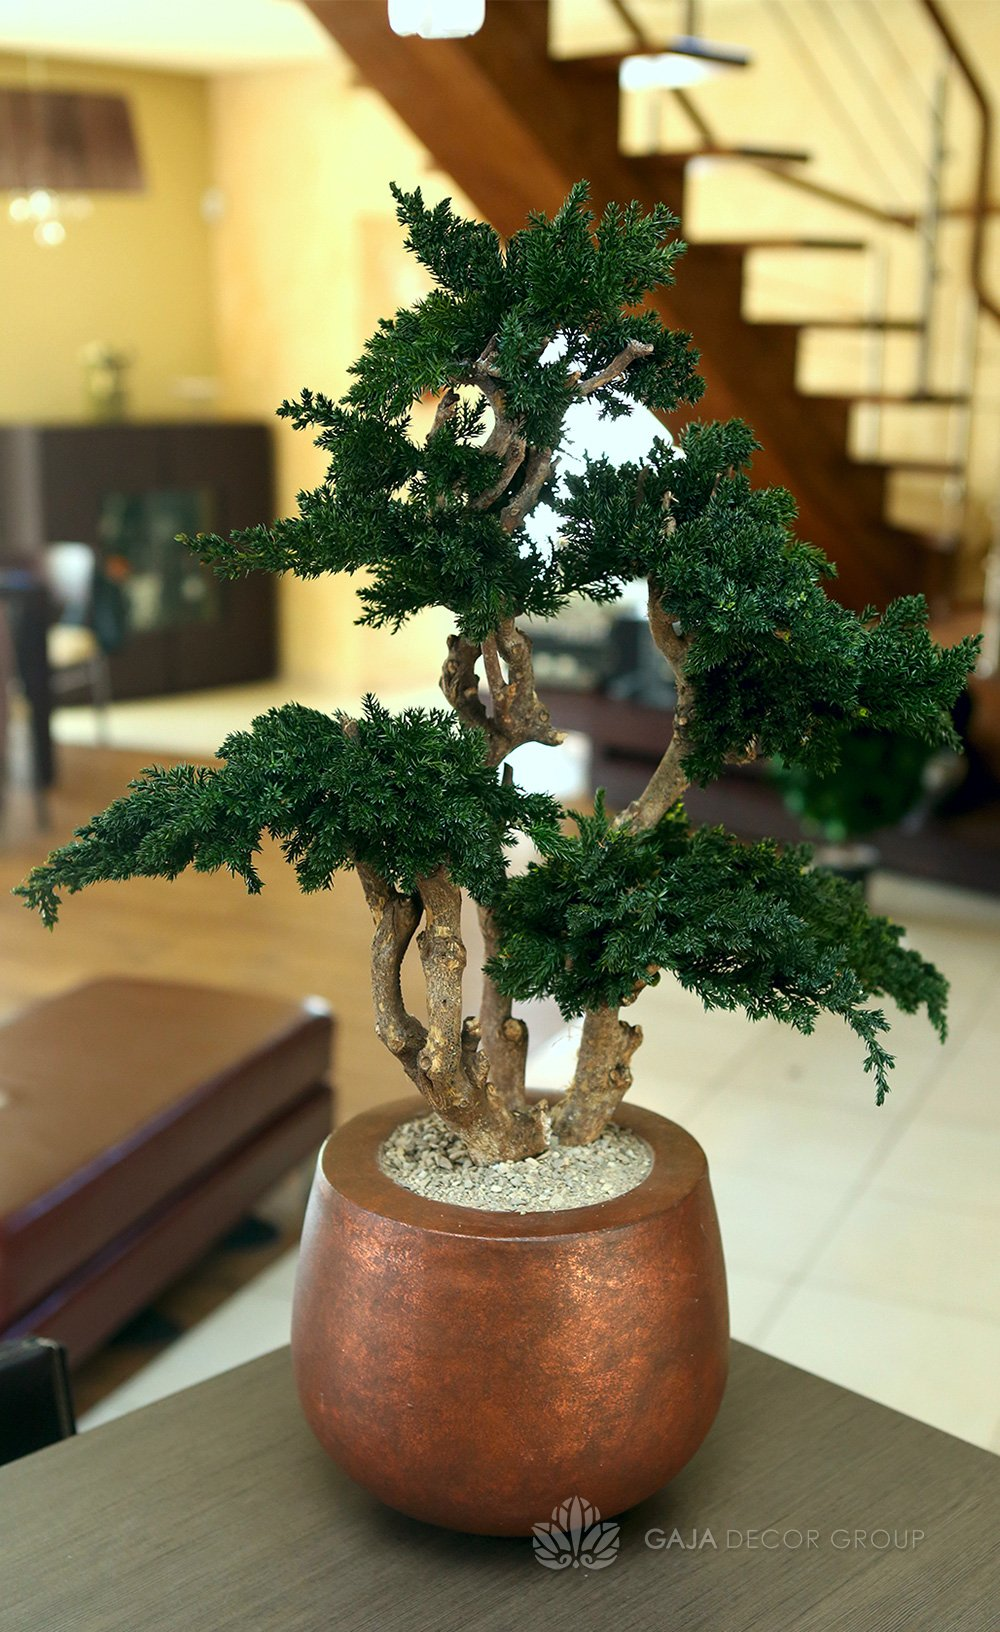 Indoor bonsai tree - GAJA DECOR GROUP